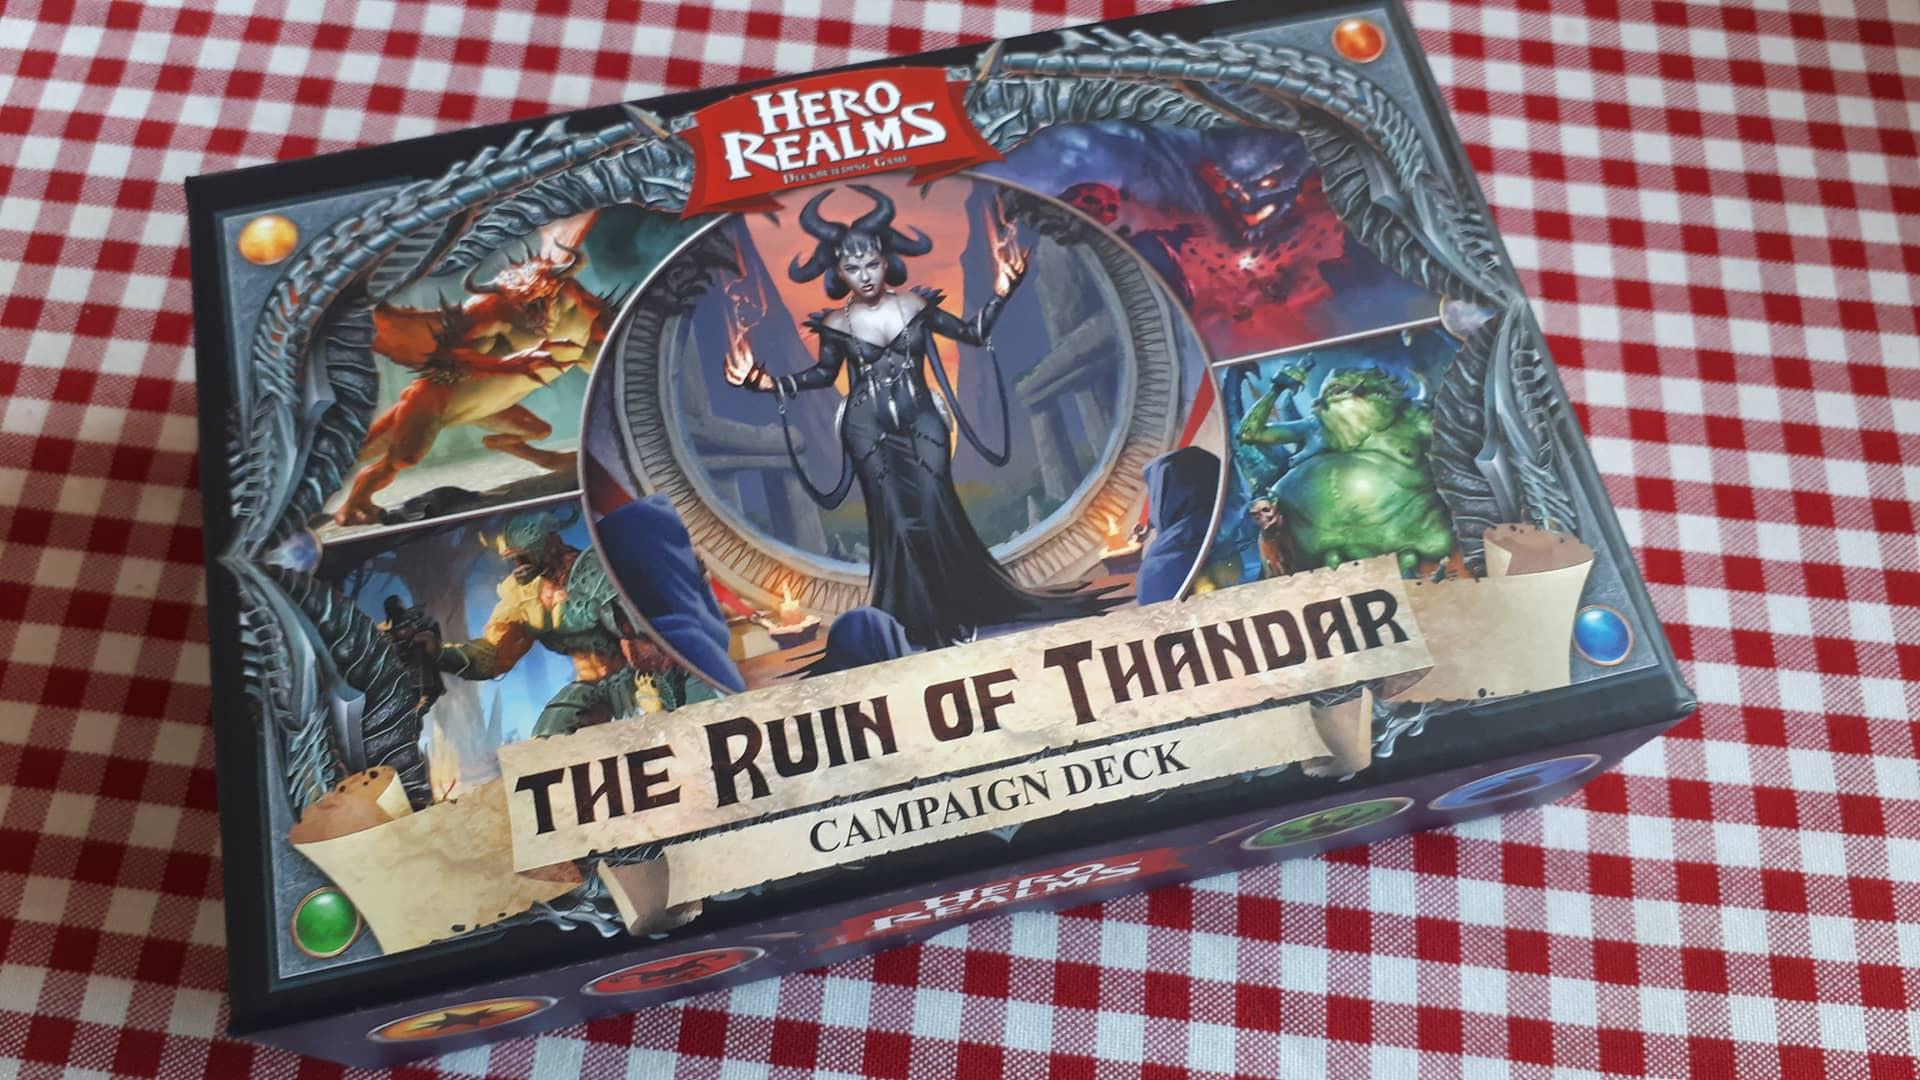 Hero Realms: The Ruins of Thandar and Boss Decks